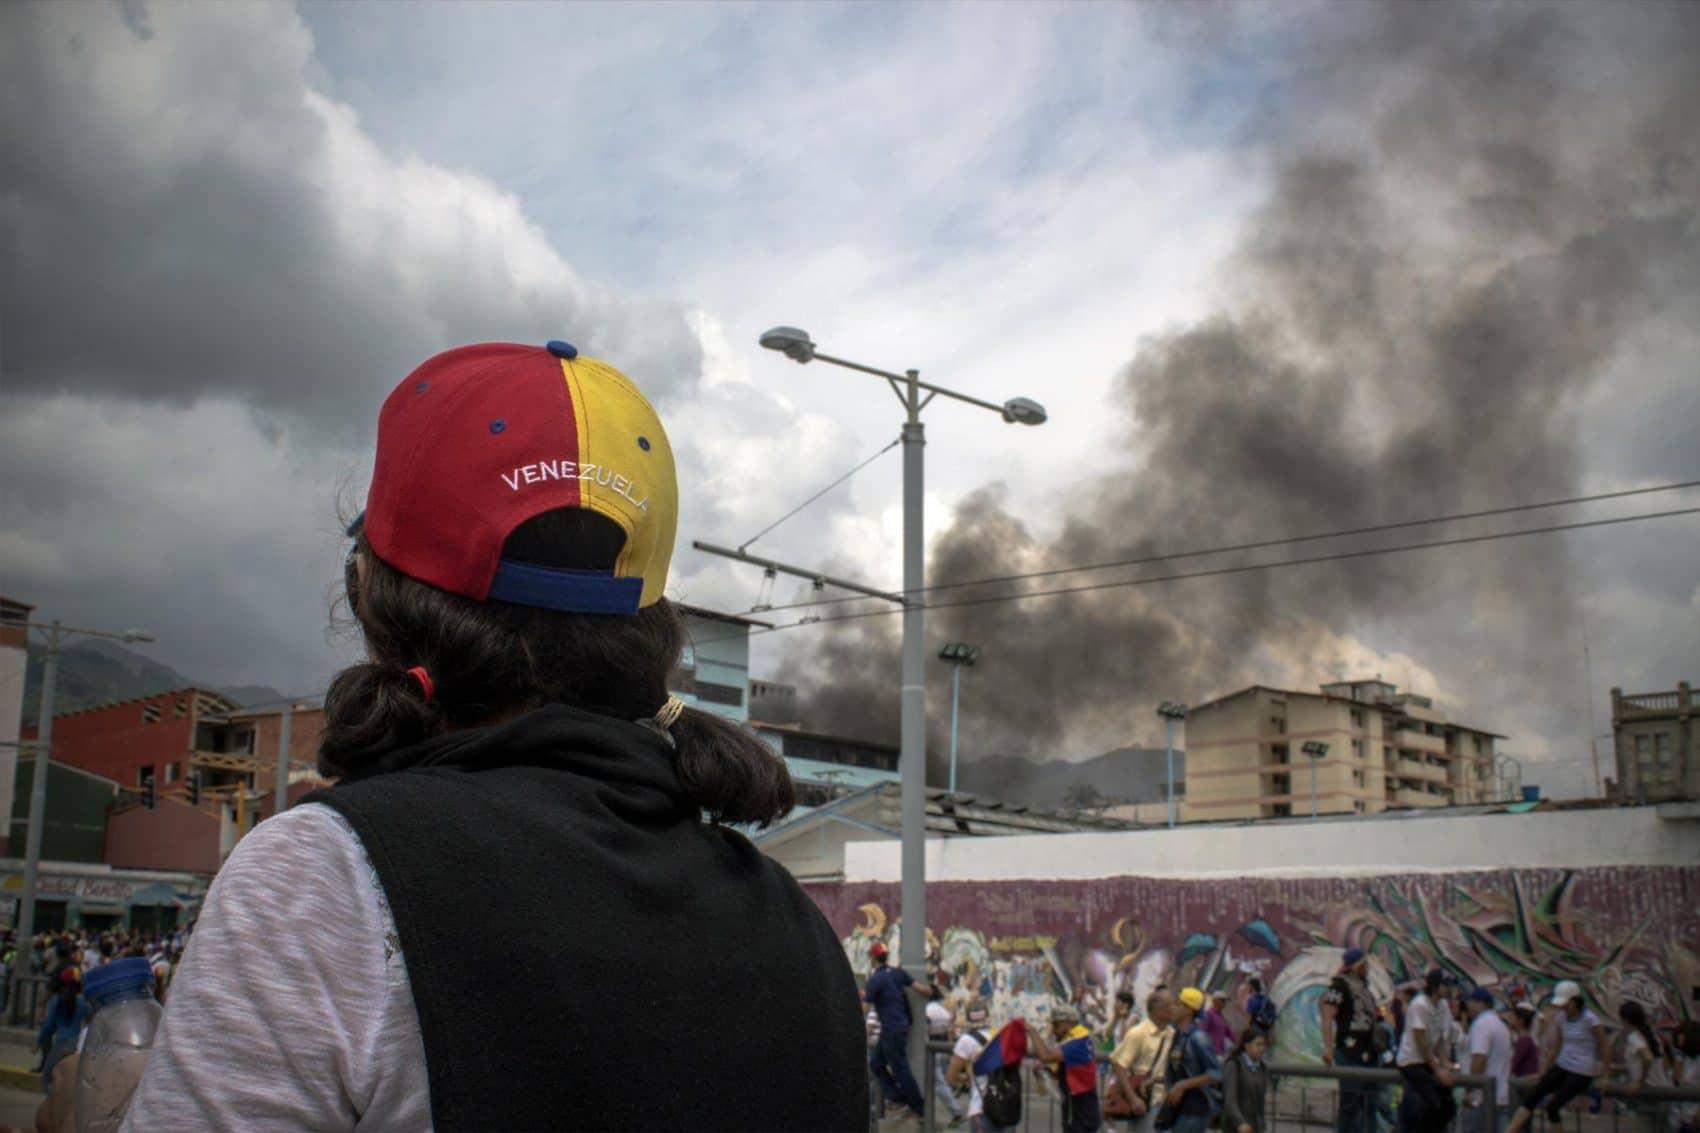 freelance documentary photographer Sebastian Astorga